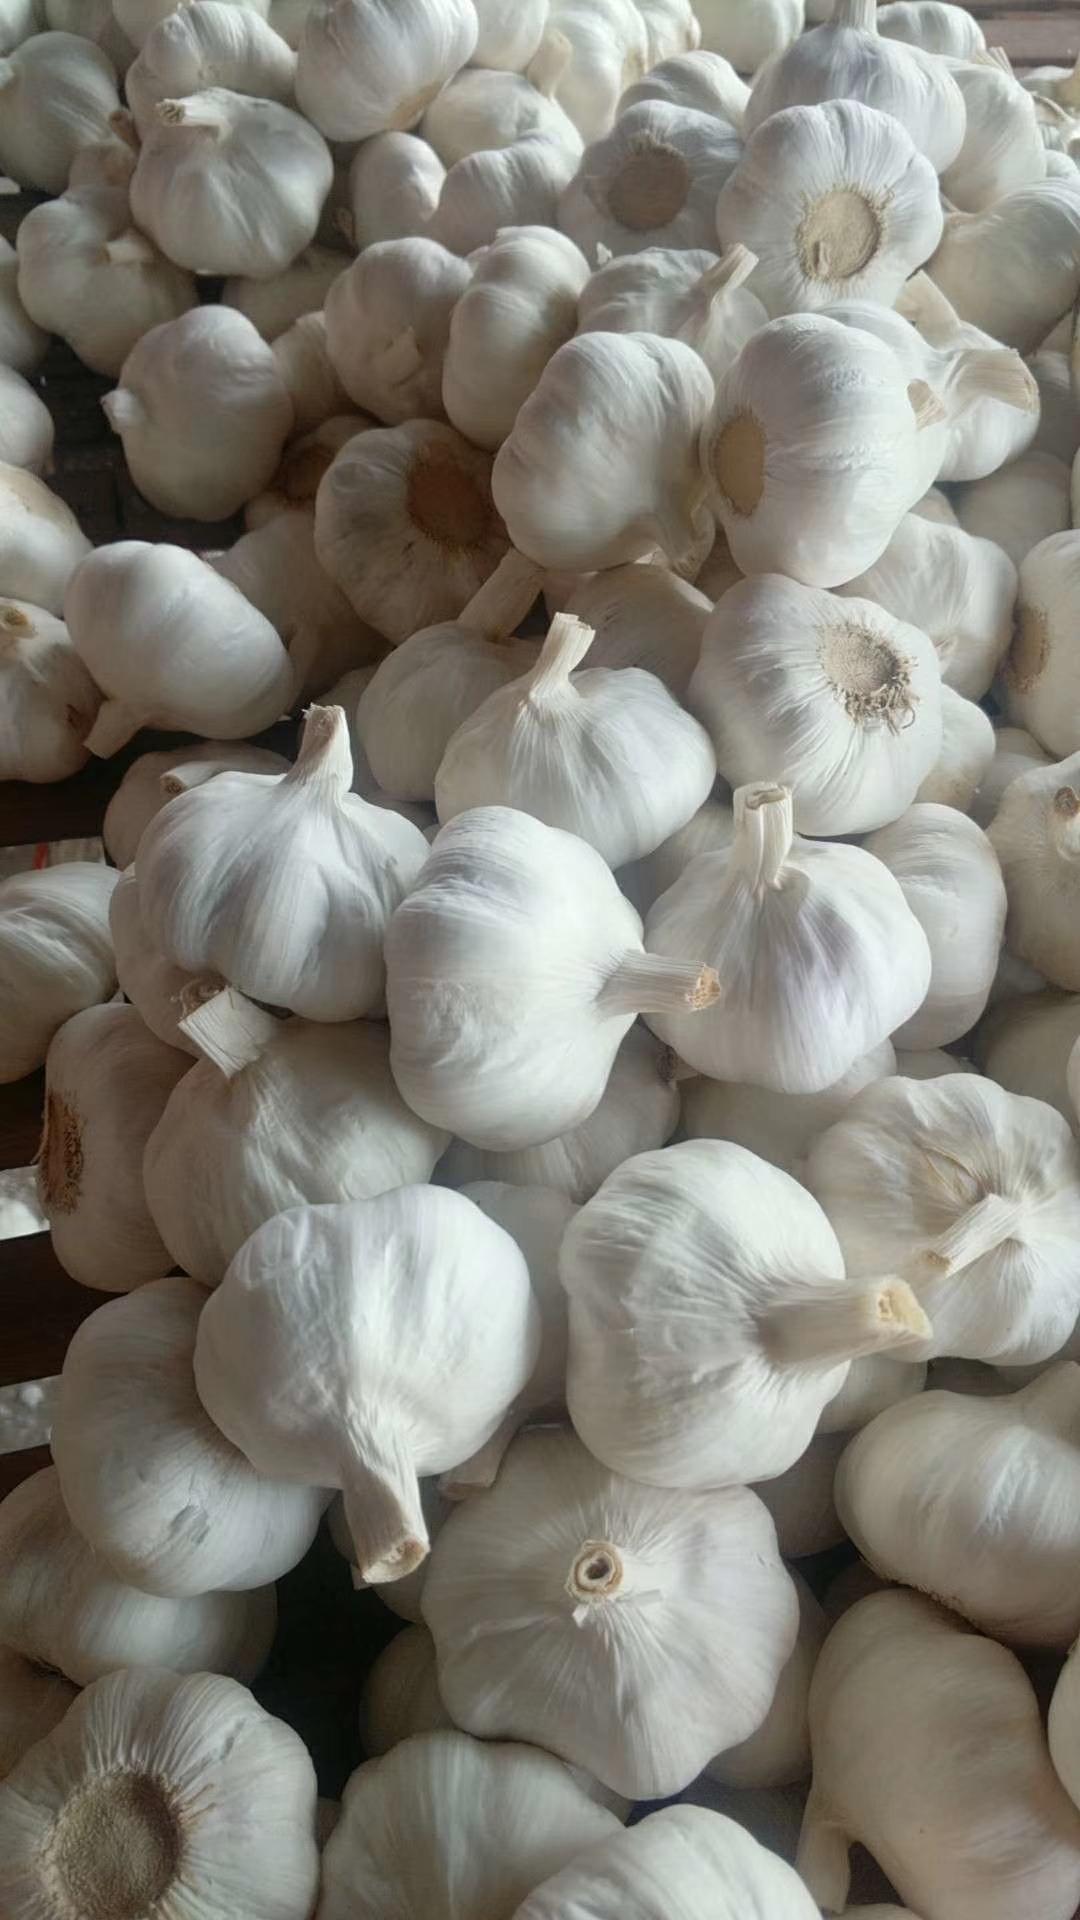 China Garlic Market Daily Report- Feb.21st, 2019